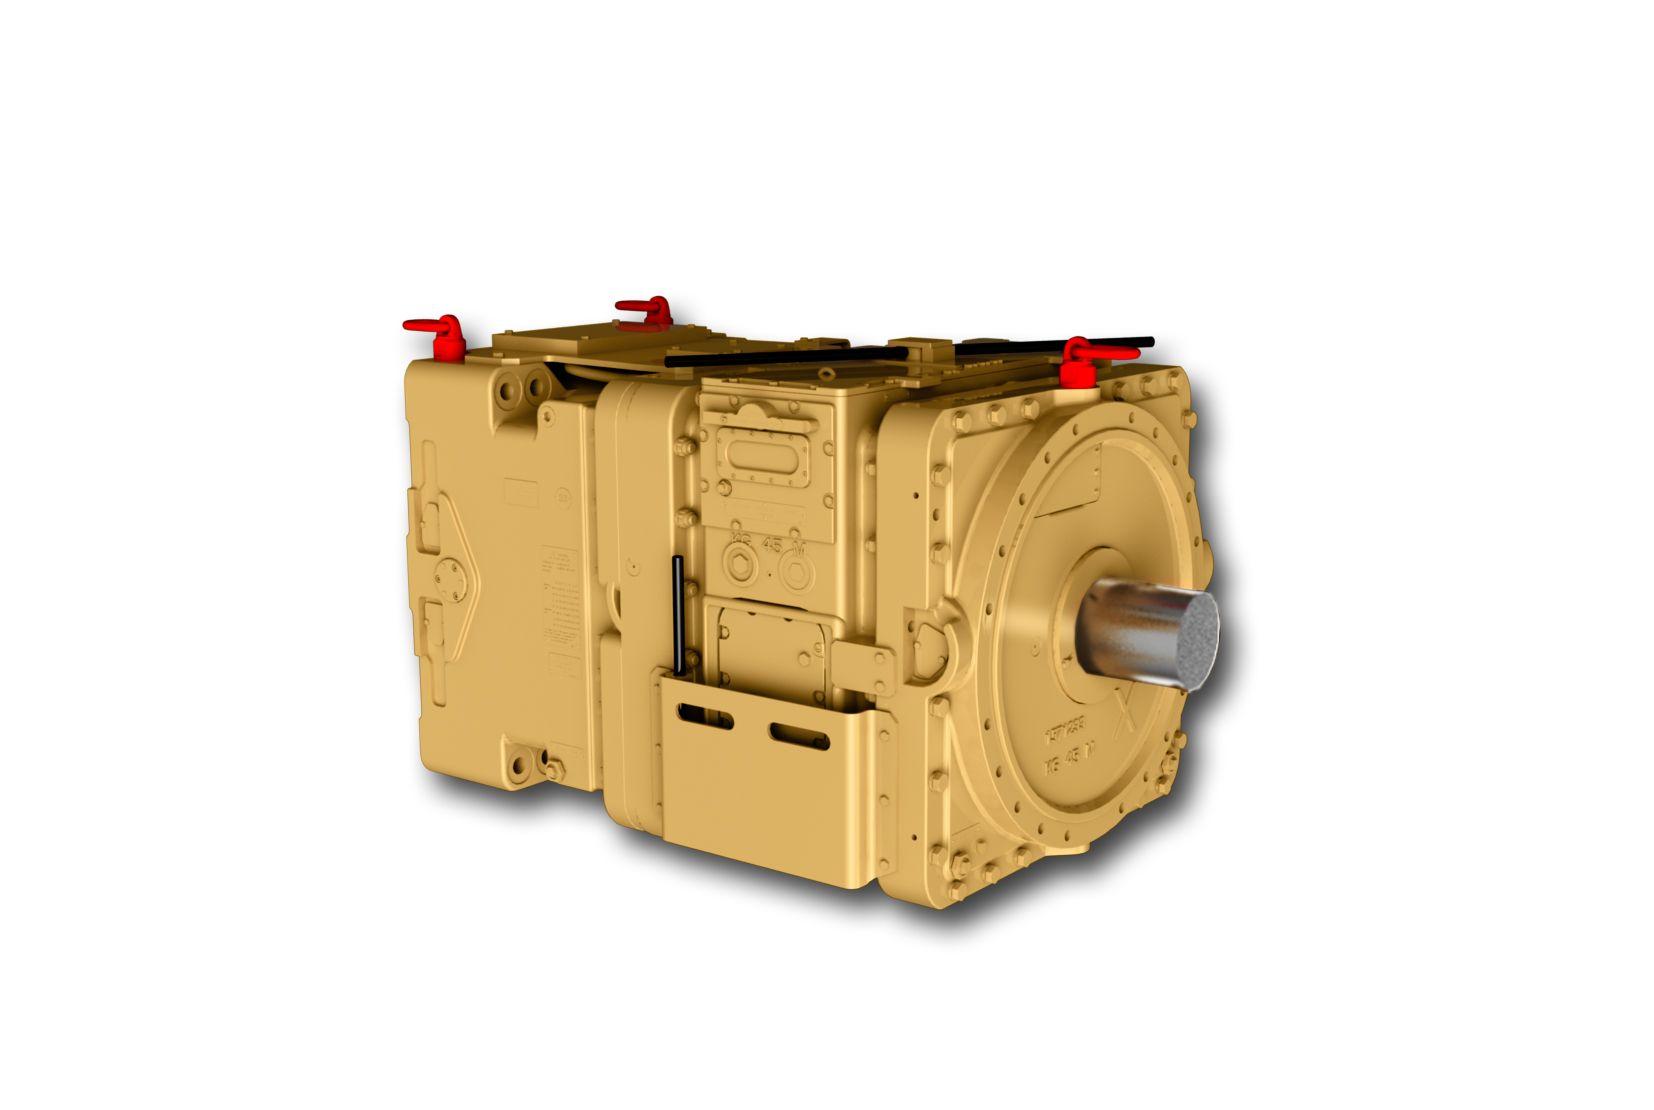 CST45 M Gearbox